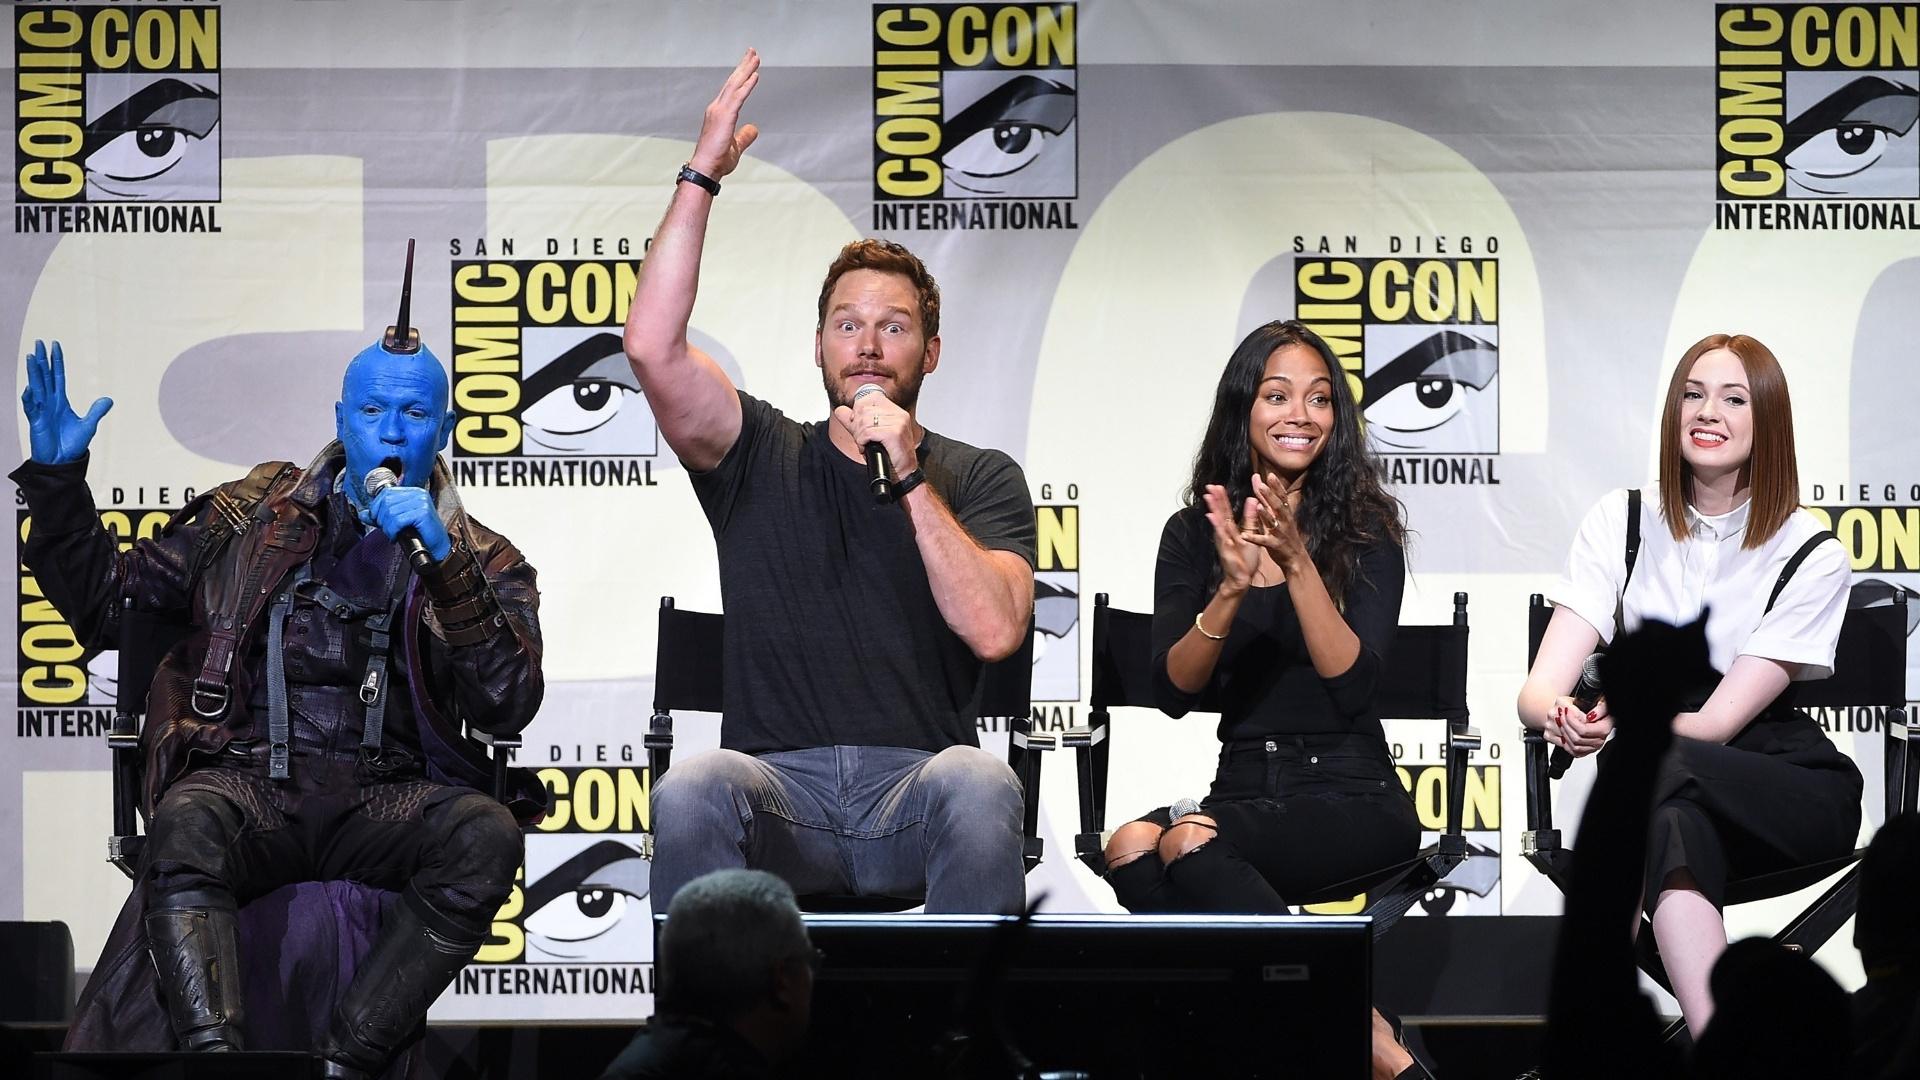 23.jul.2016 - Michael Rooker, caracterizado de Yondu, Chris Pratt, Zoe Saldana e Karen Gillan participam de painel de